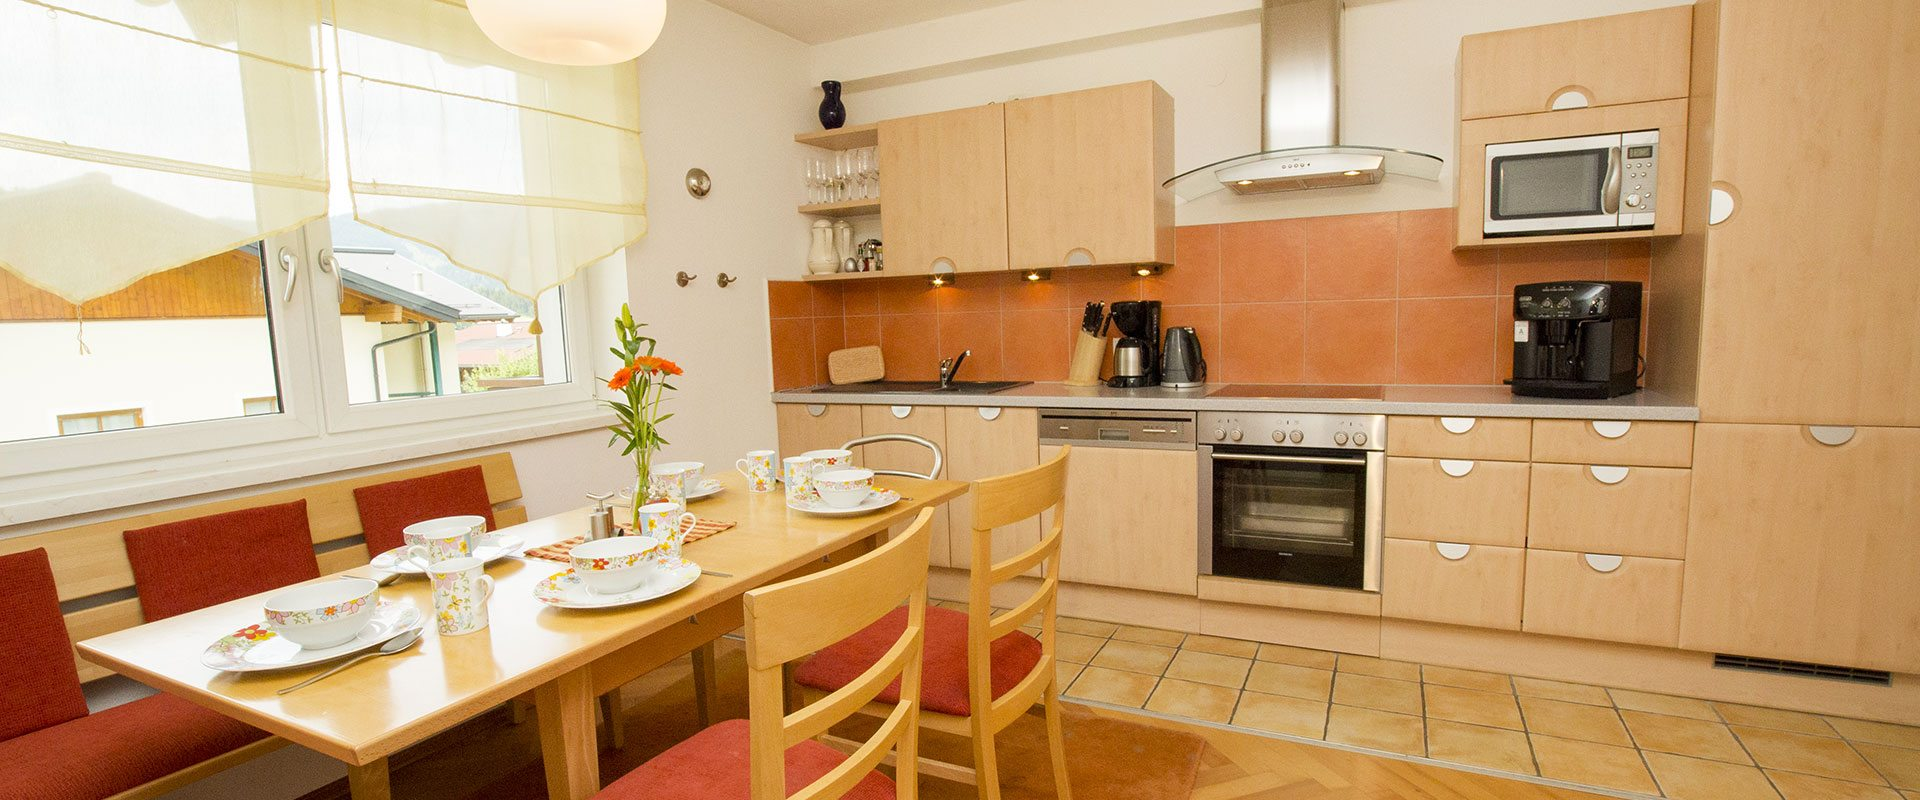 Appartements in Flachau - Appartements Sunside